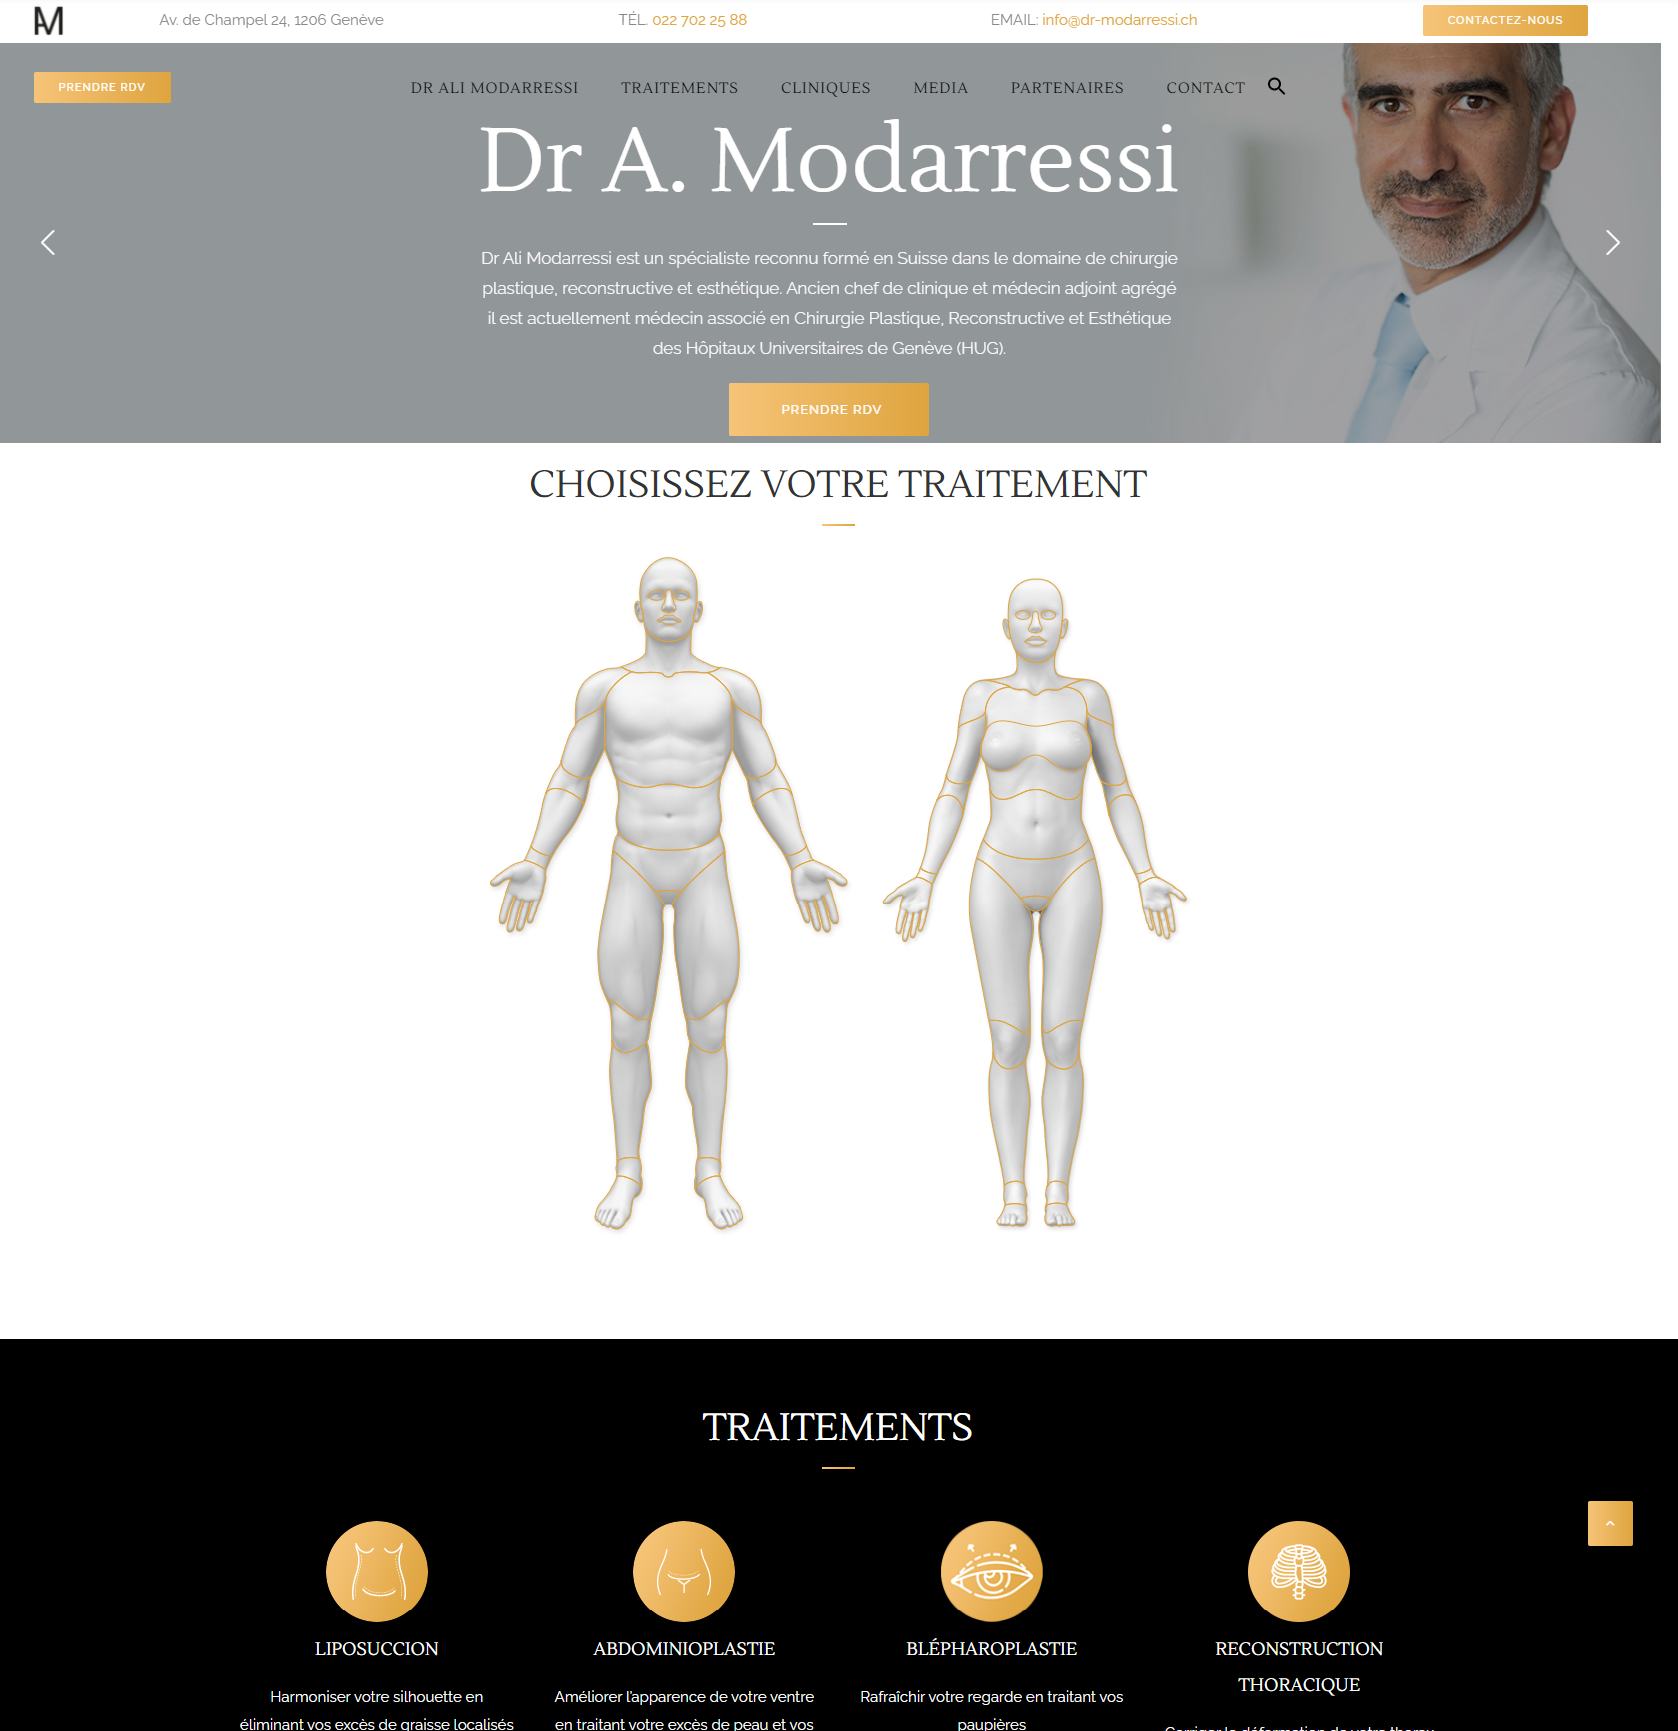 Dr Ali Modarressi image